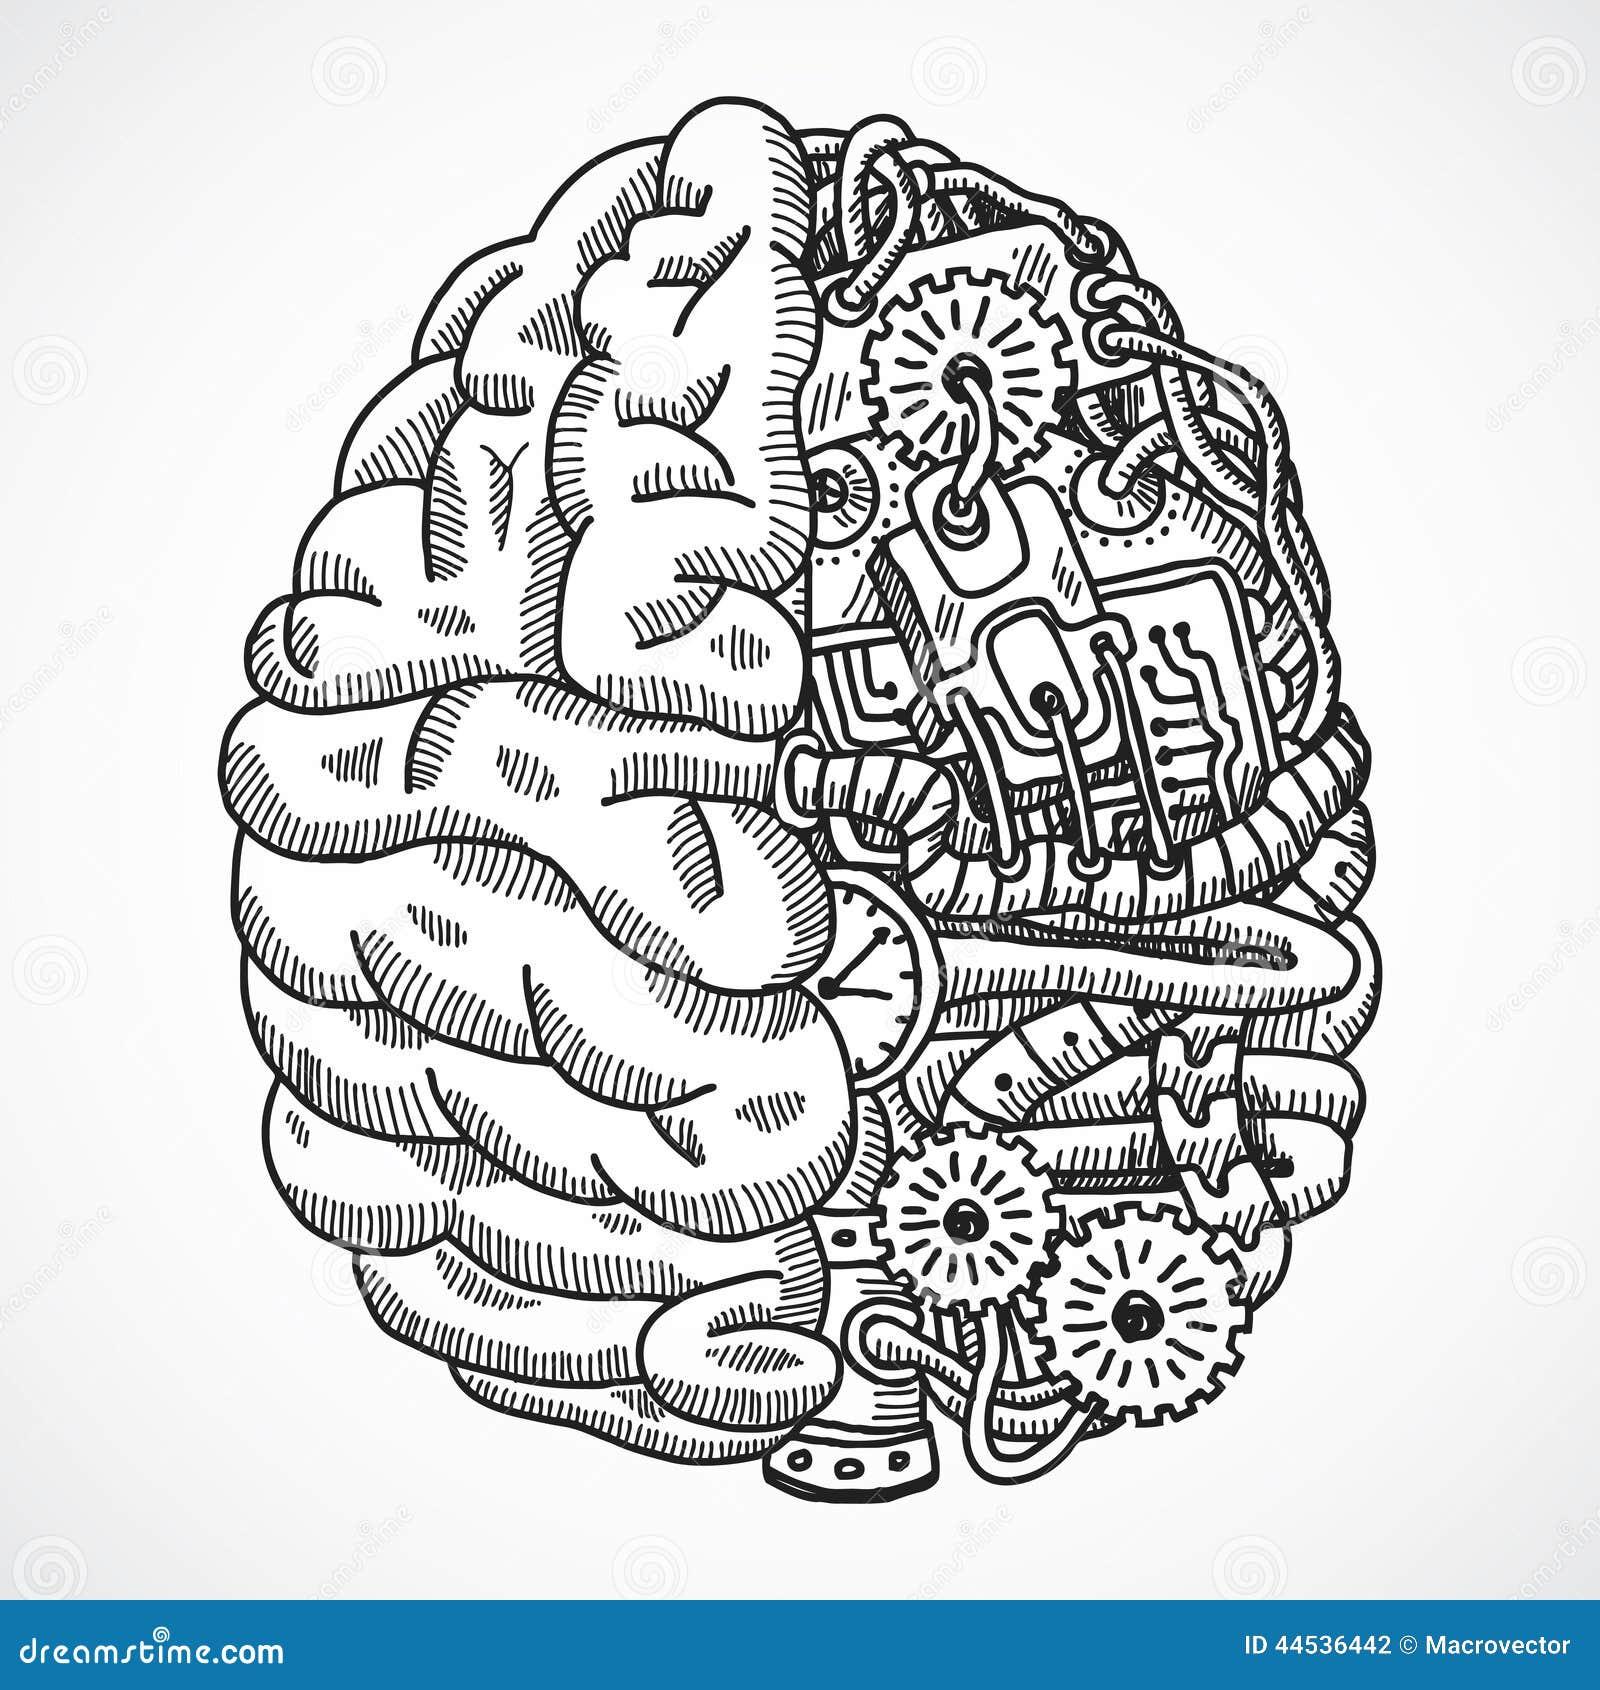 brain as processing machine stock vector